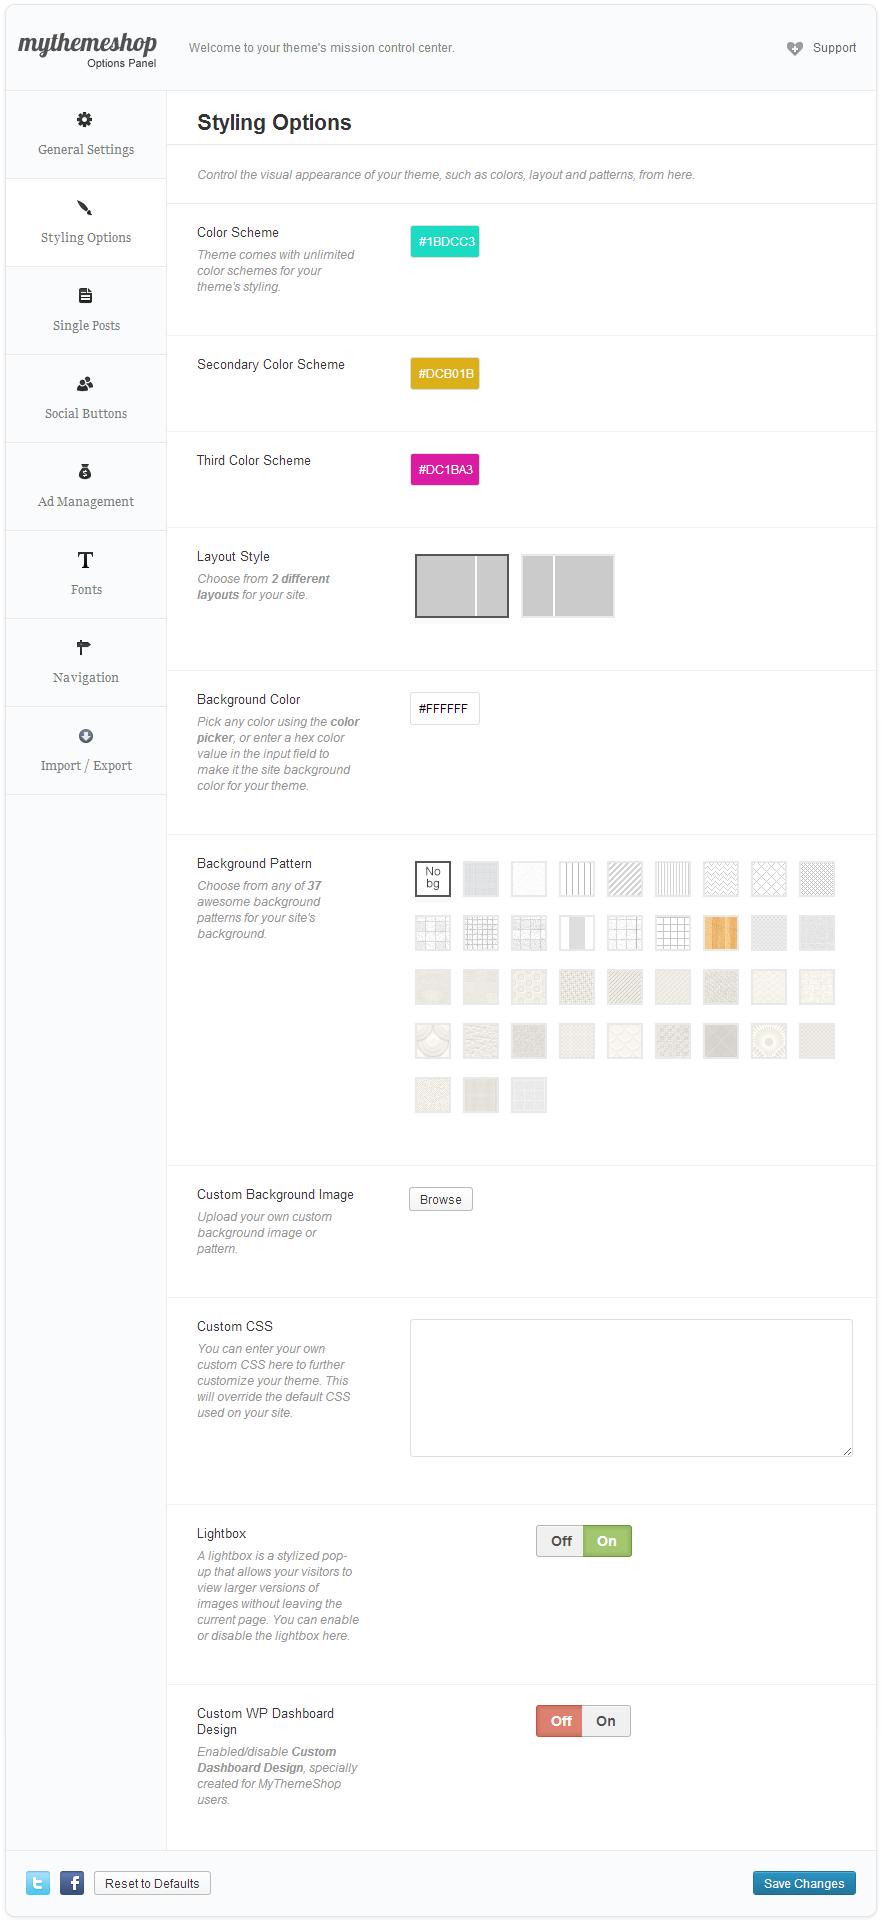 Digitalis Customization Options